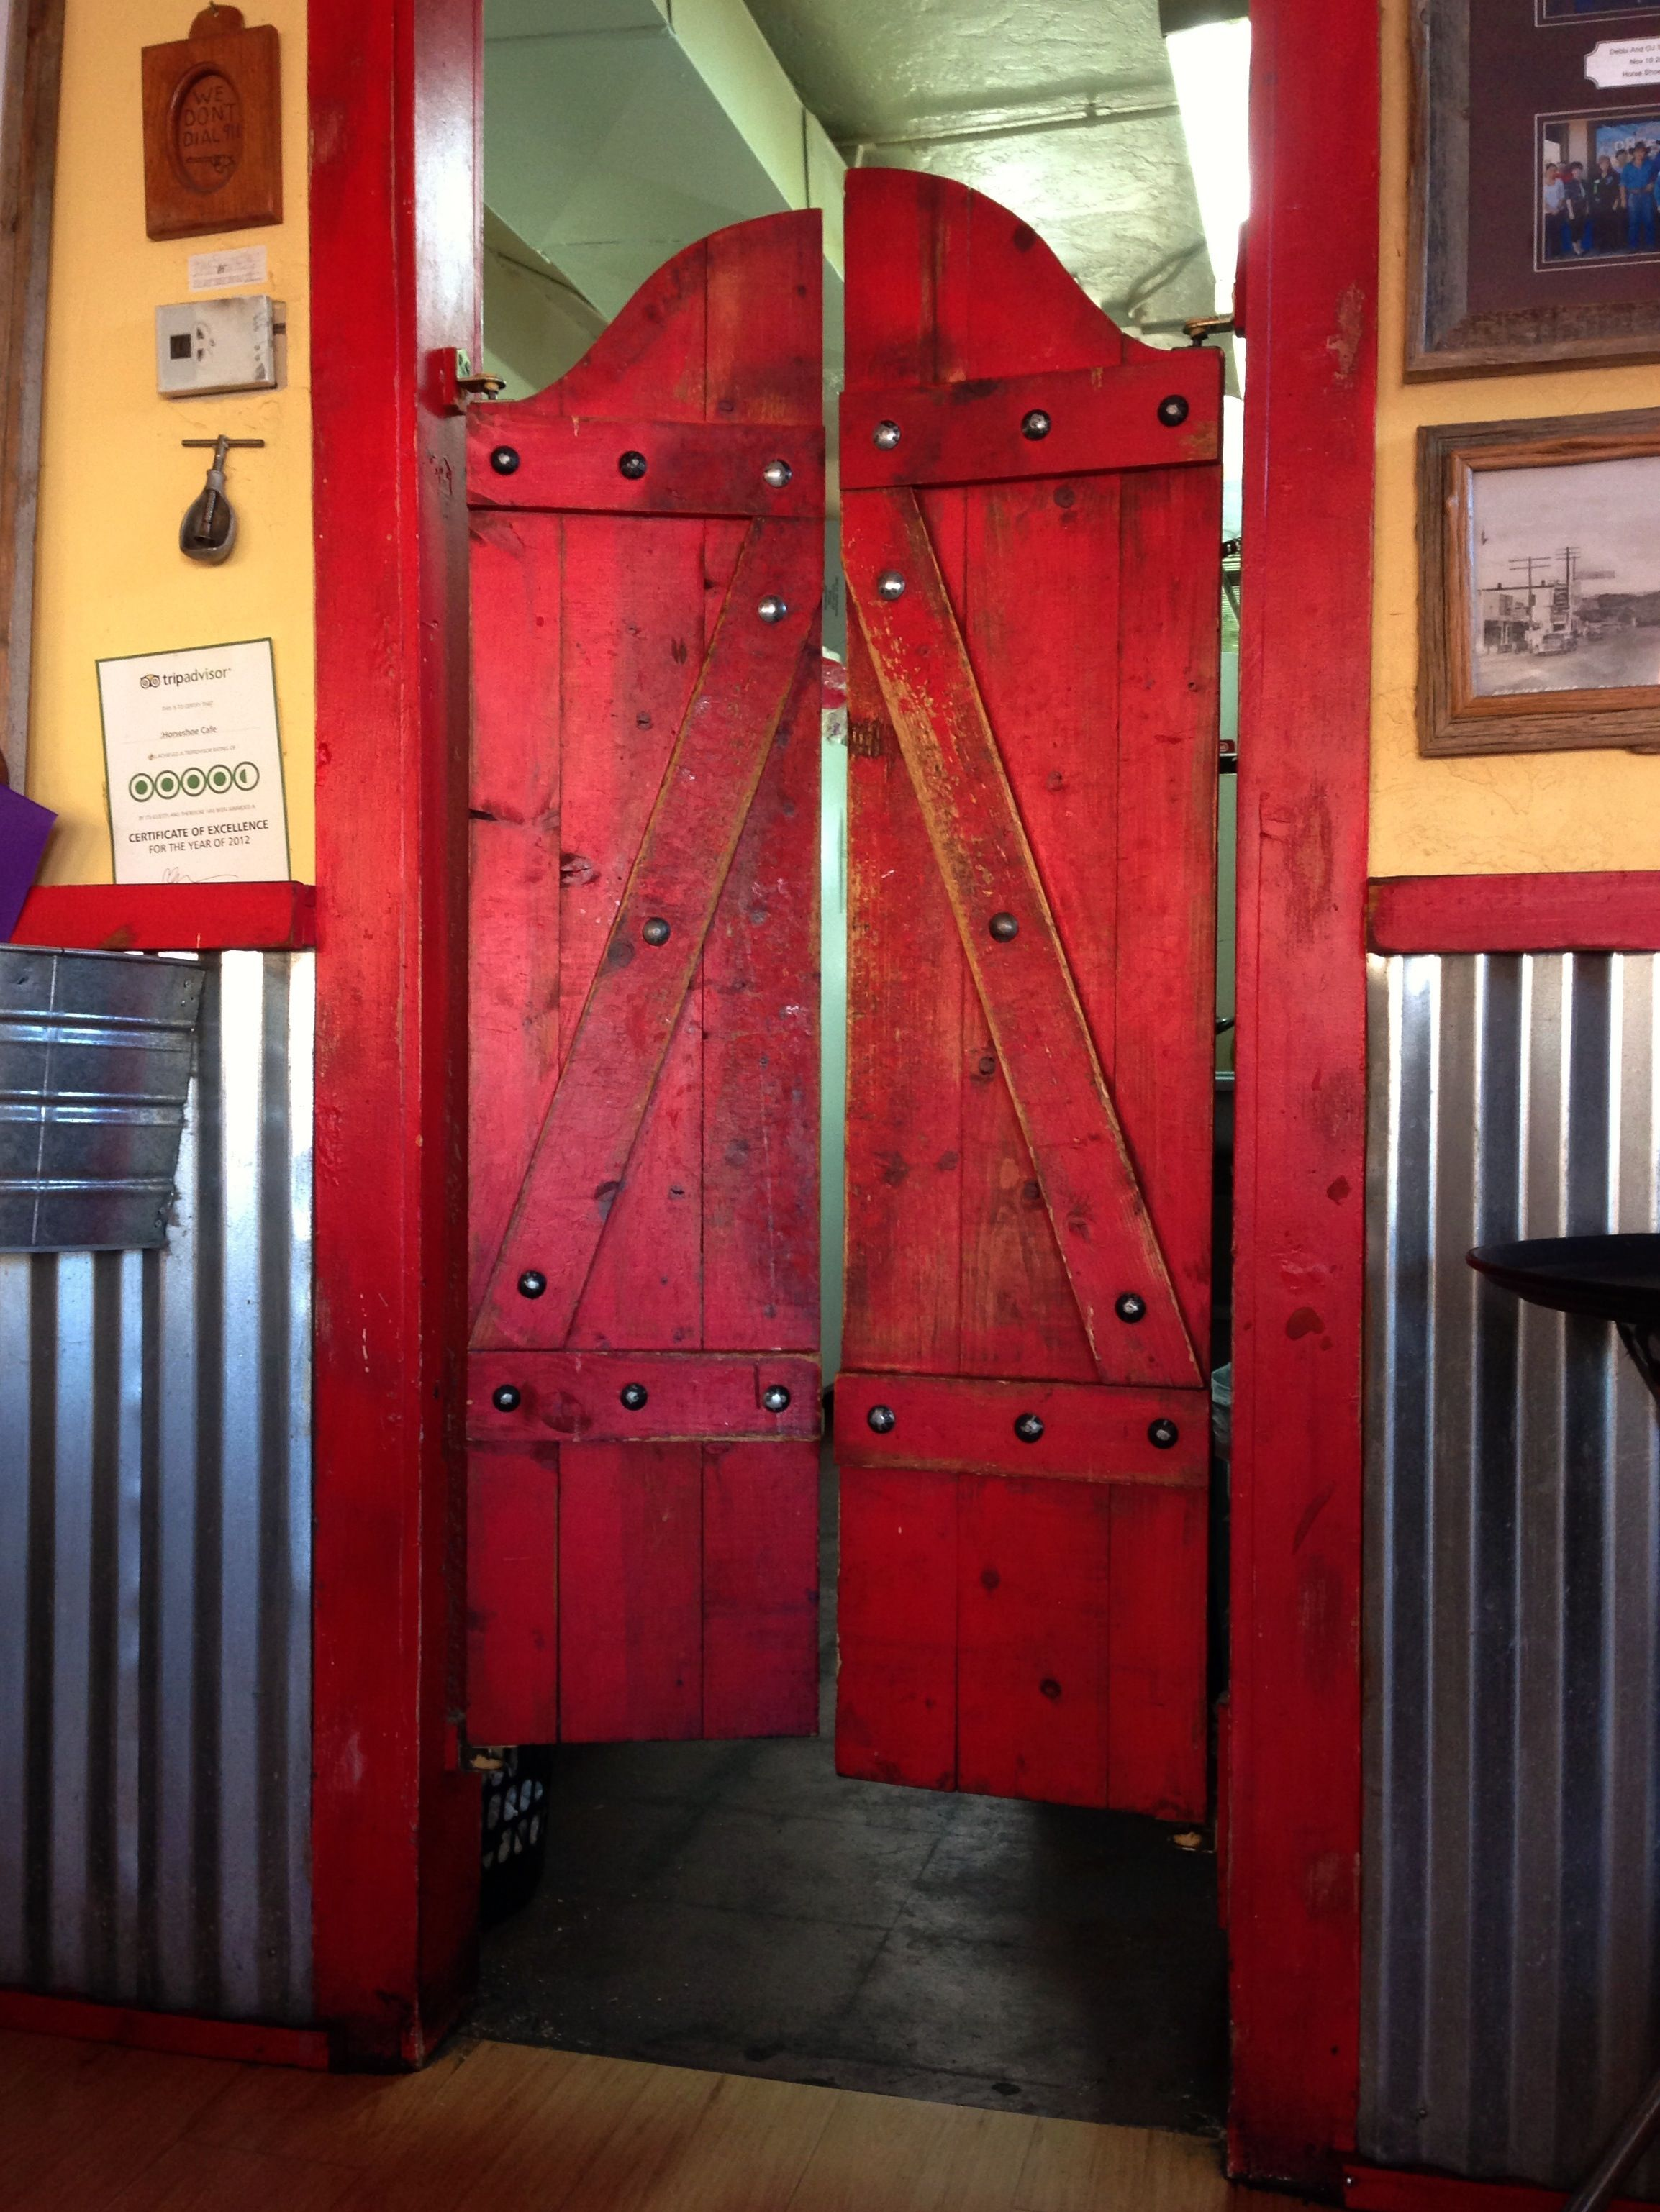 Beautiful Saloon Doors at the Horseshoe Cafe in Wickenburg Arizona - photo by Ken Bosma at the Horseshoe Cafe in Wickenburg Arizona & Custom Full Length Cafe Doors/ Saloon Interior Doors | Garages ... Pezcame.Com